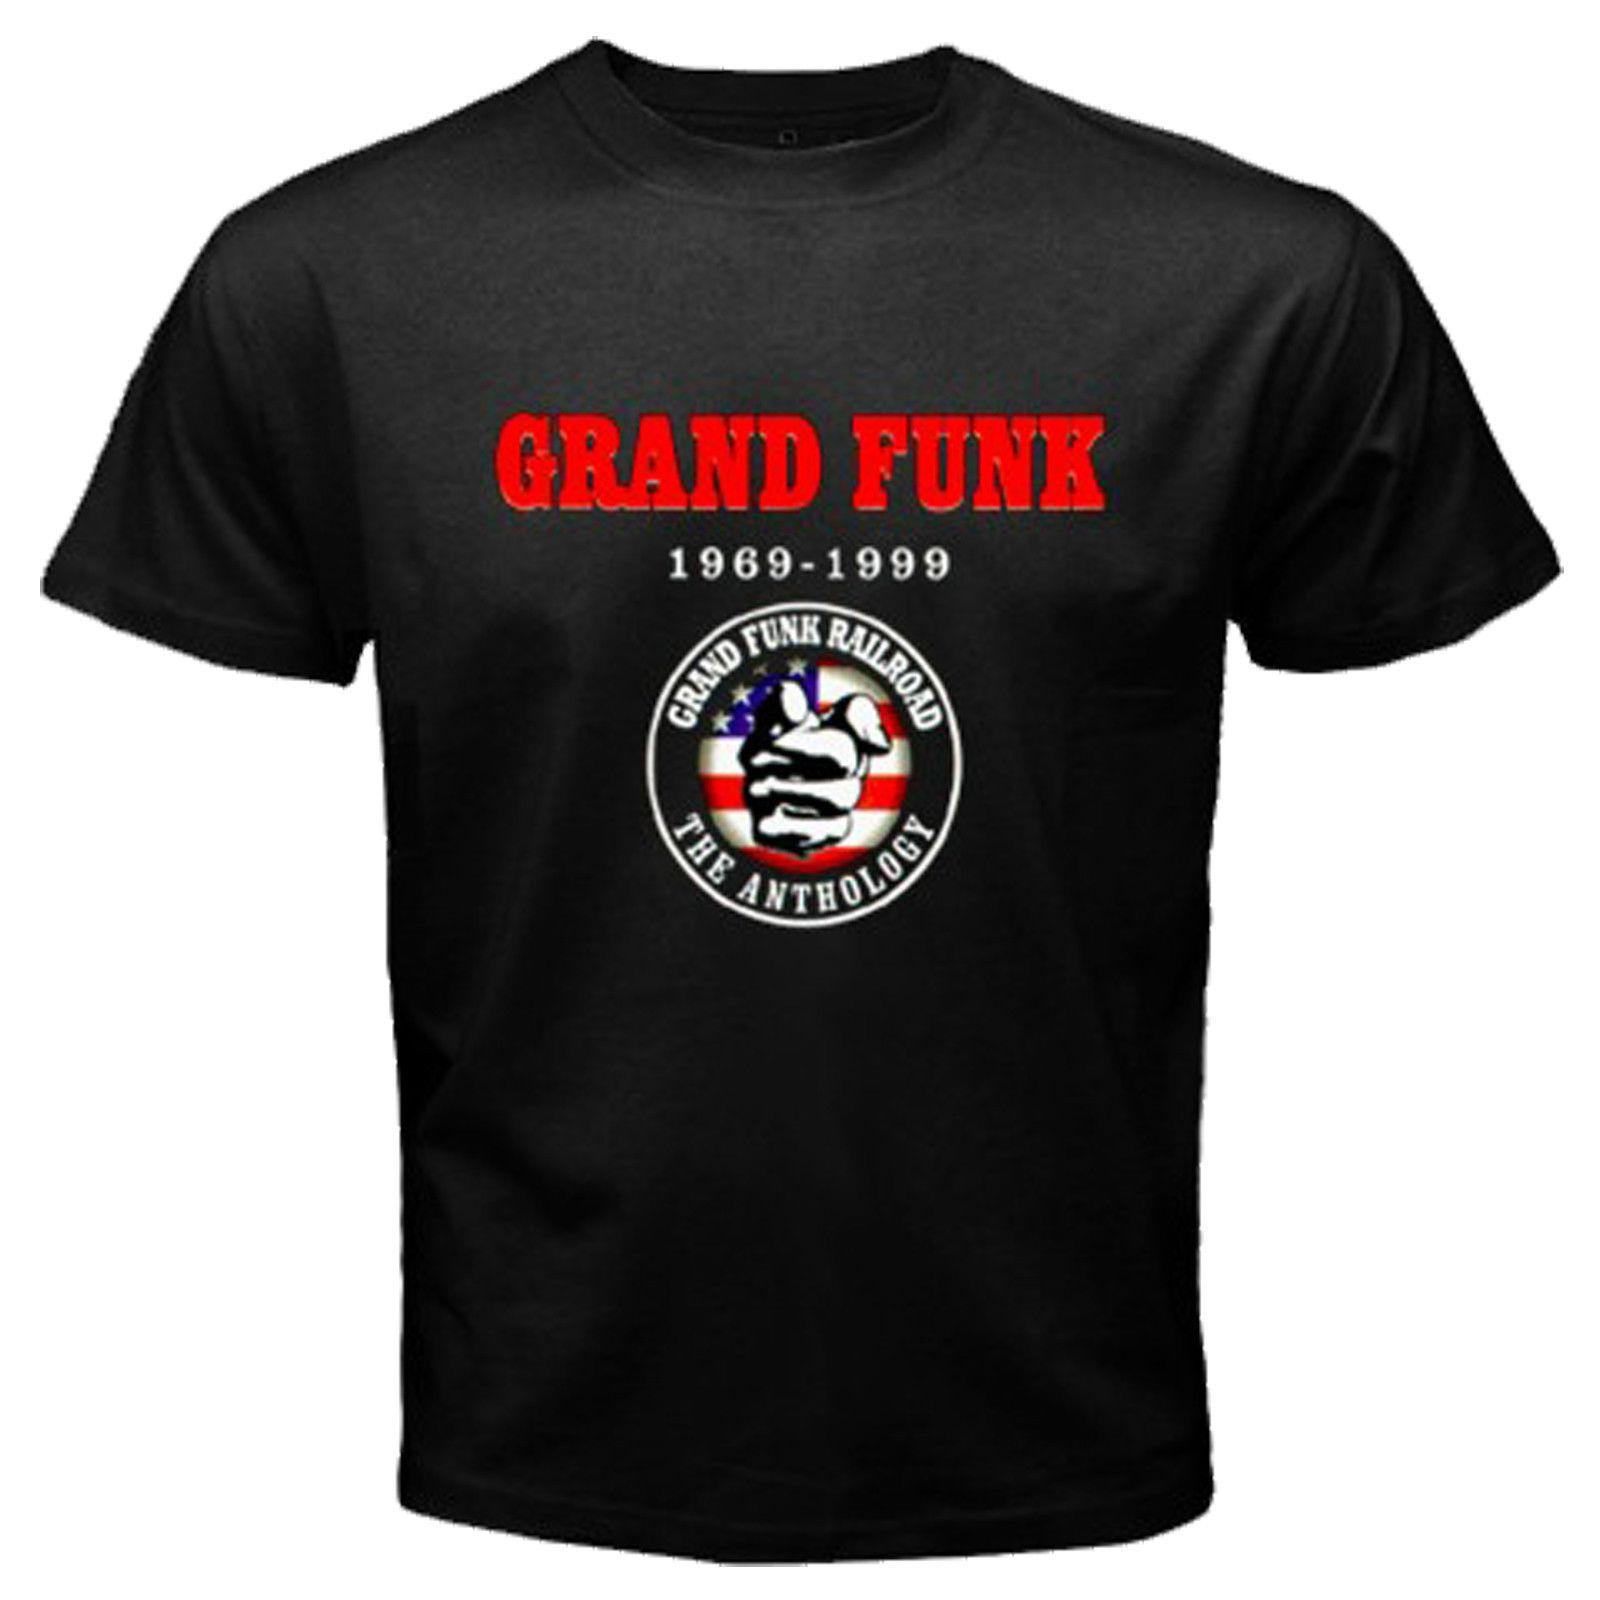 HOT VINTAGE GRAND FUNK RAILROAD American Rock Band T-SHIRT